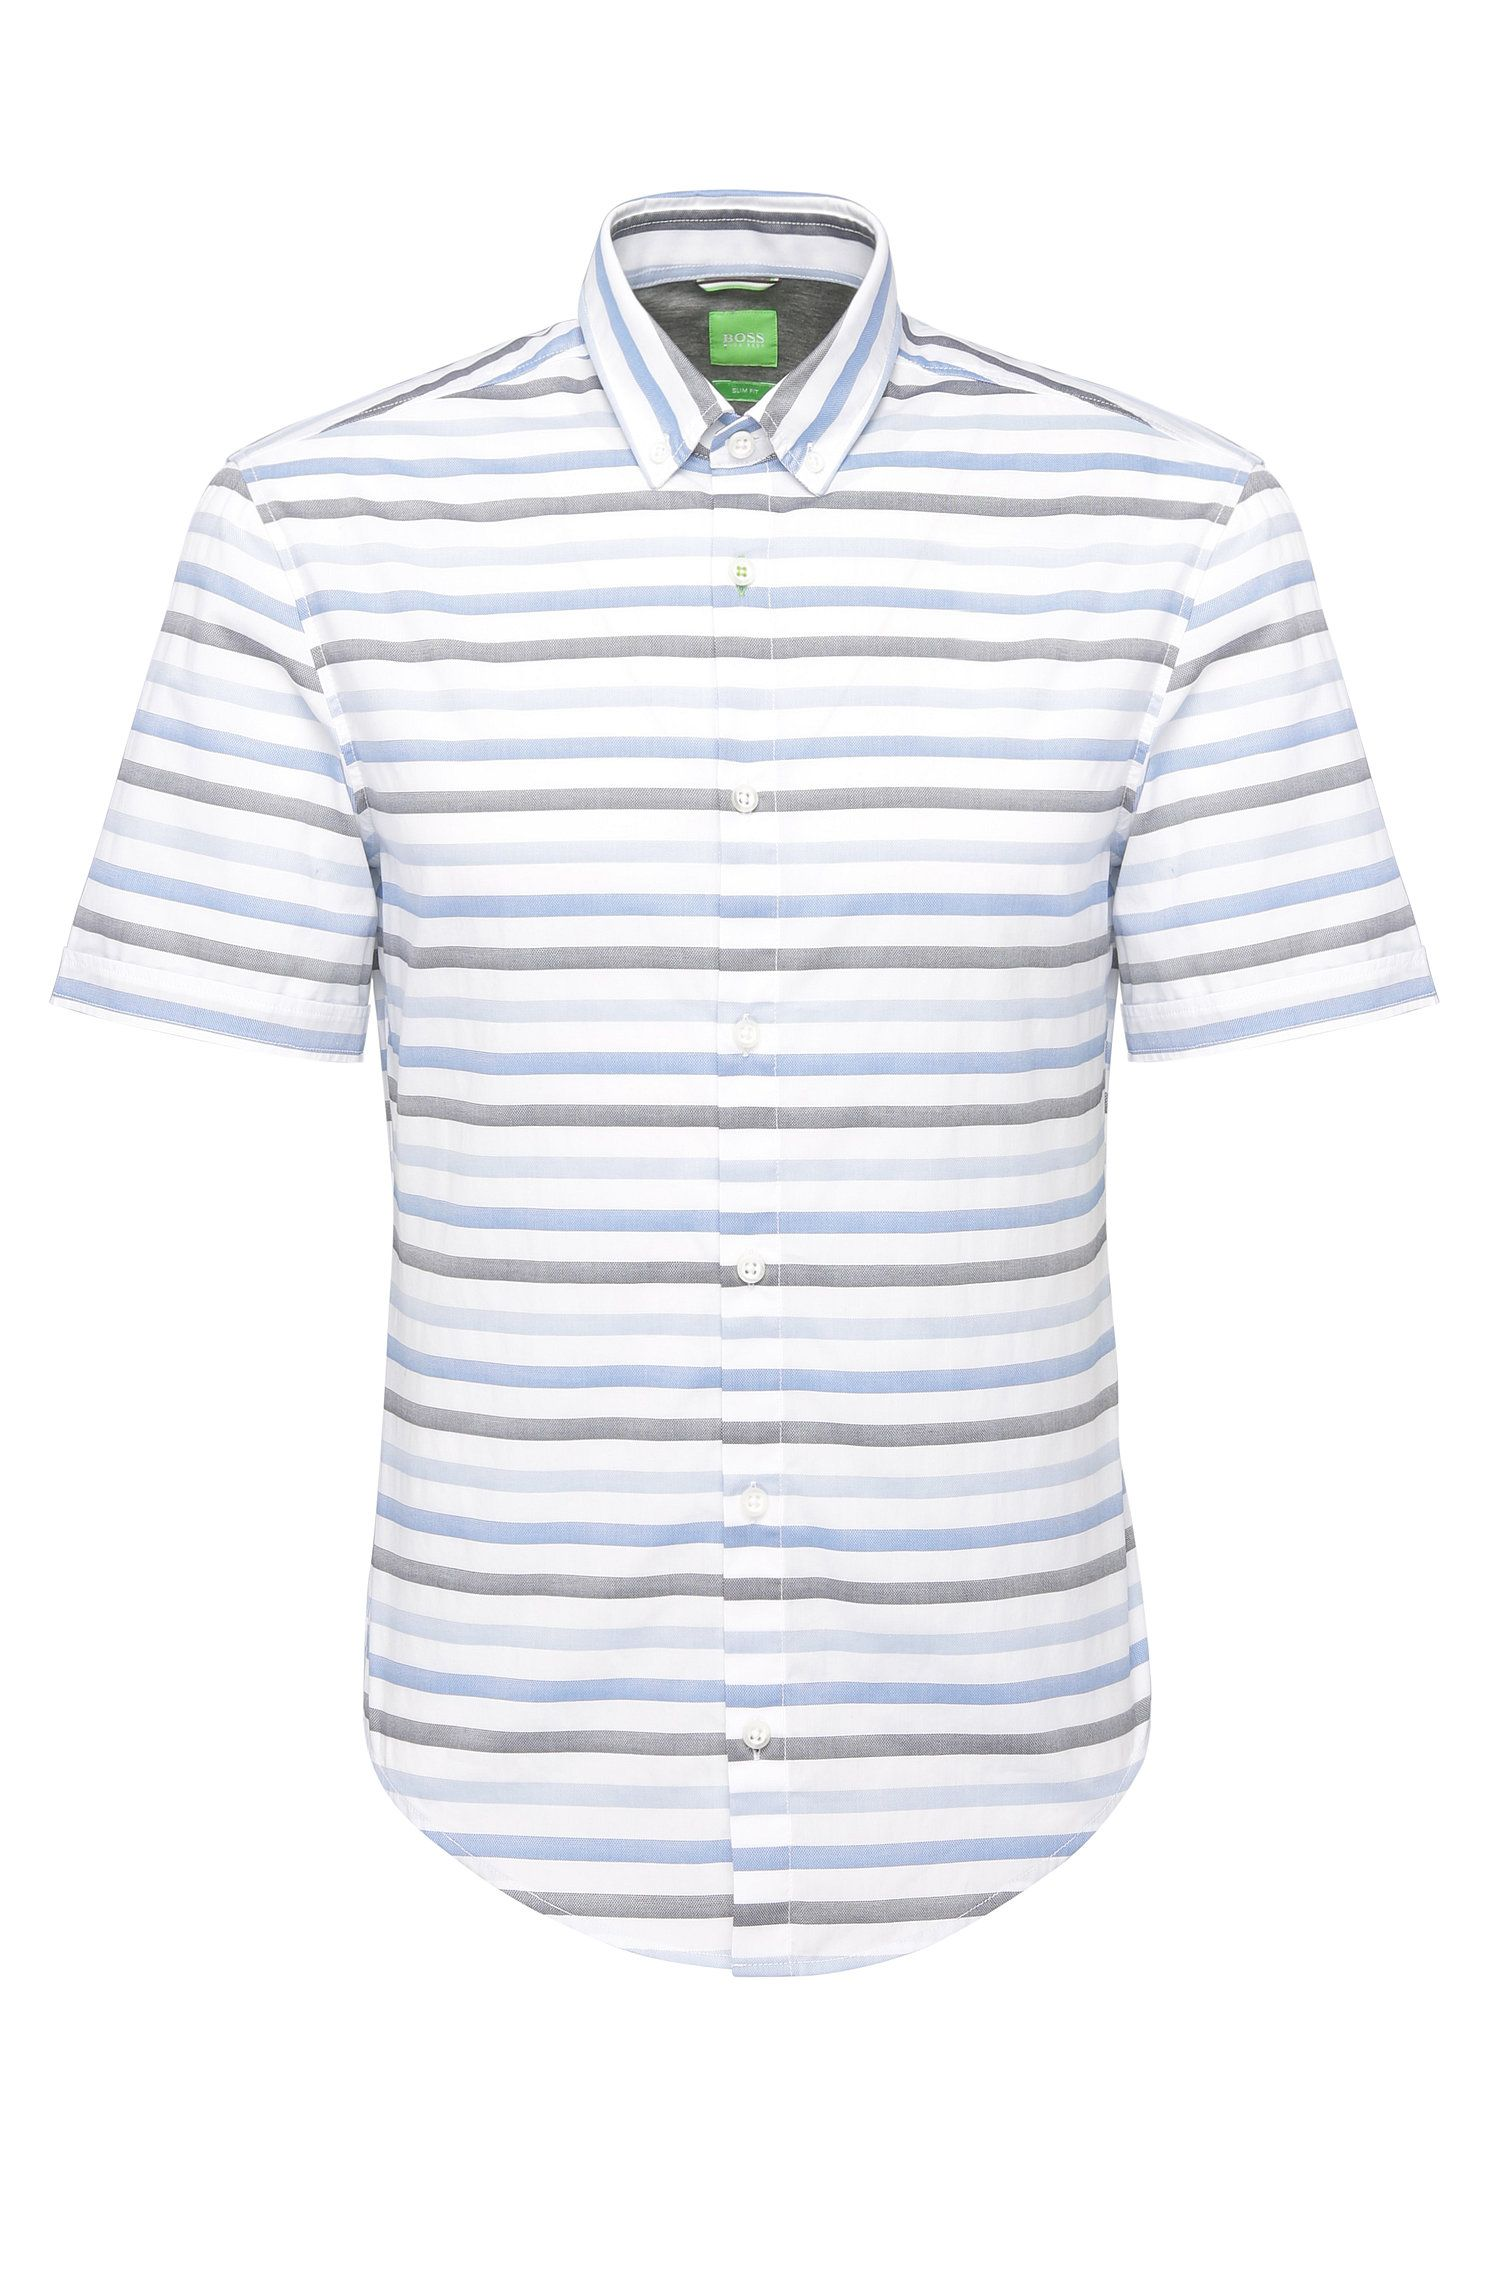 'Beltrame' | Slim Fit, Cotton Button Down Shirt